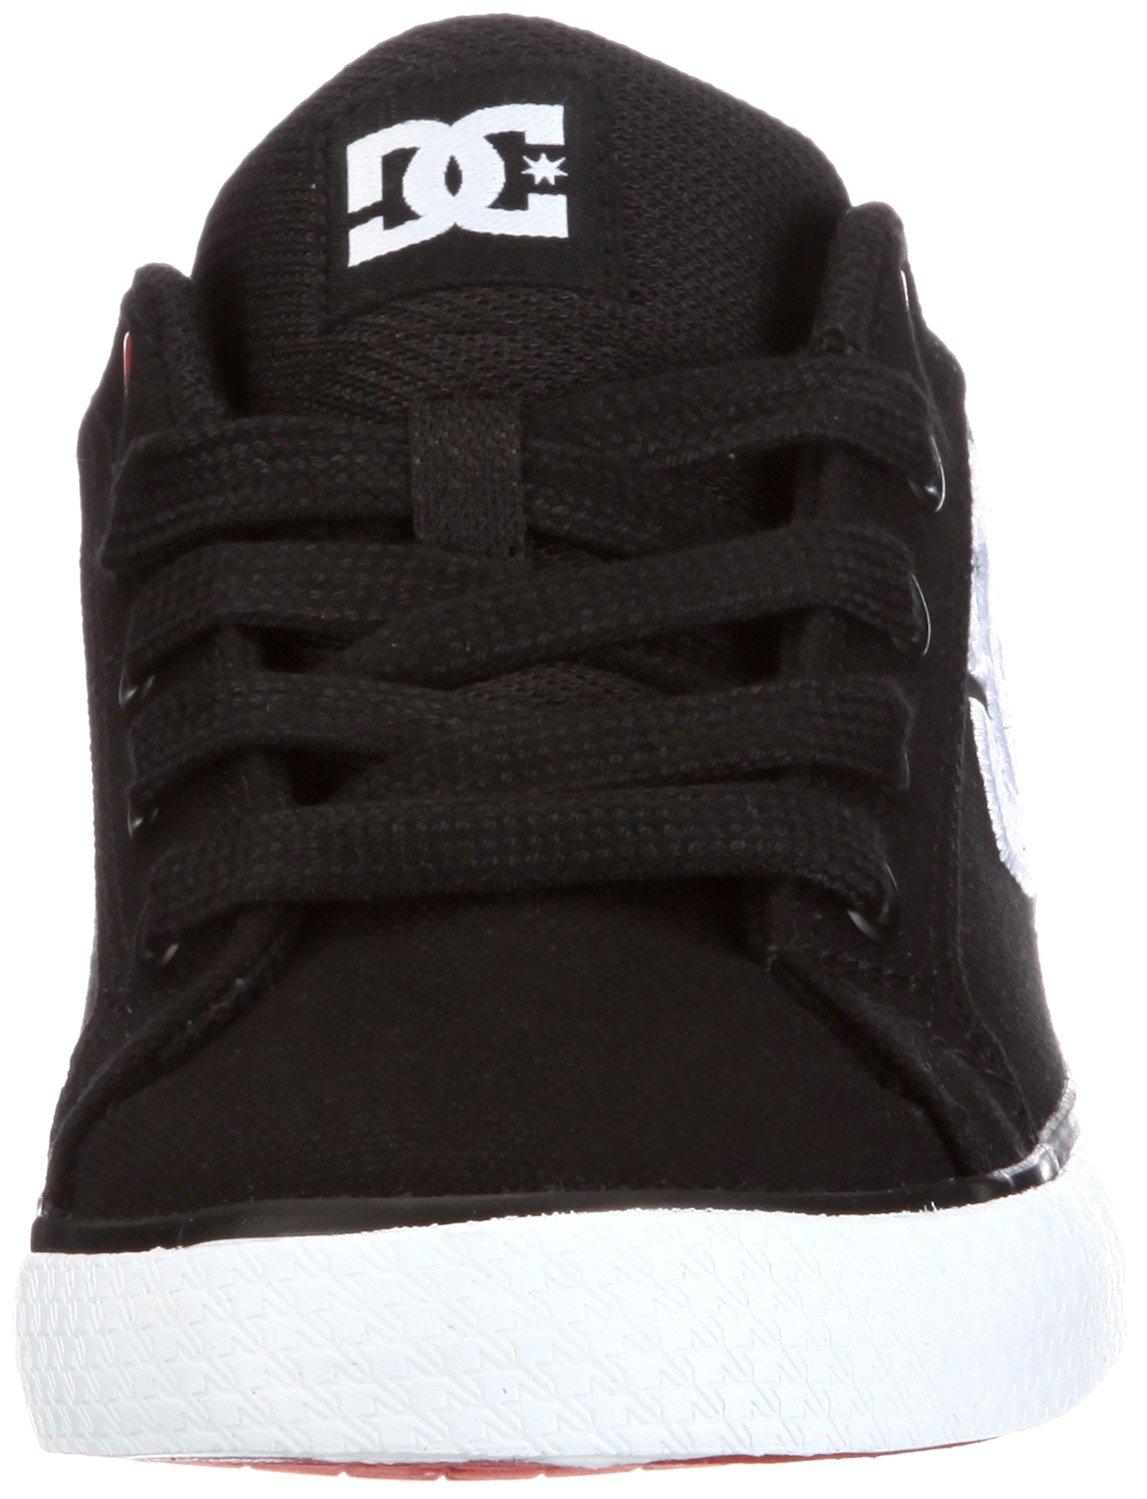 DC Women's Chelsea Tx B(M) Action Sports Shoe B004LZ4RMM 11 B(M) Tx US|Black 944ca7